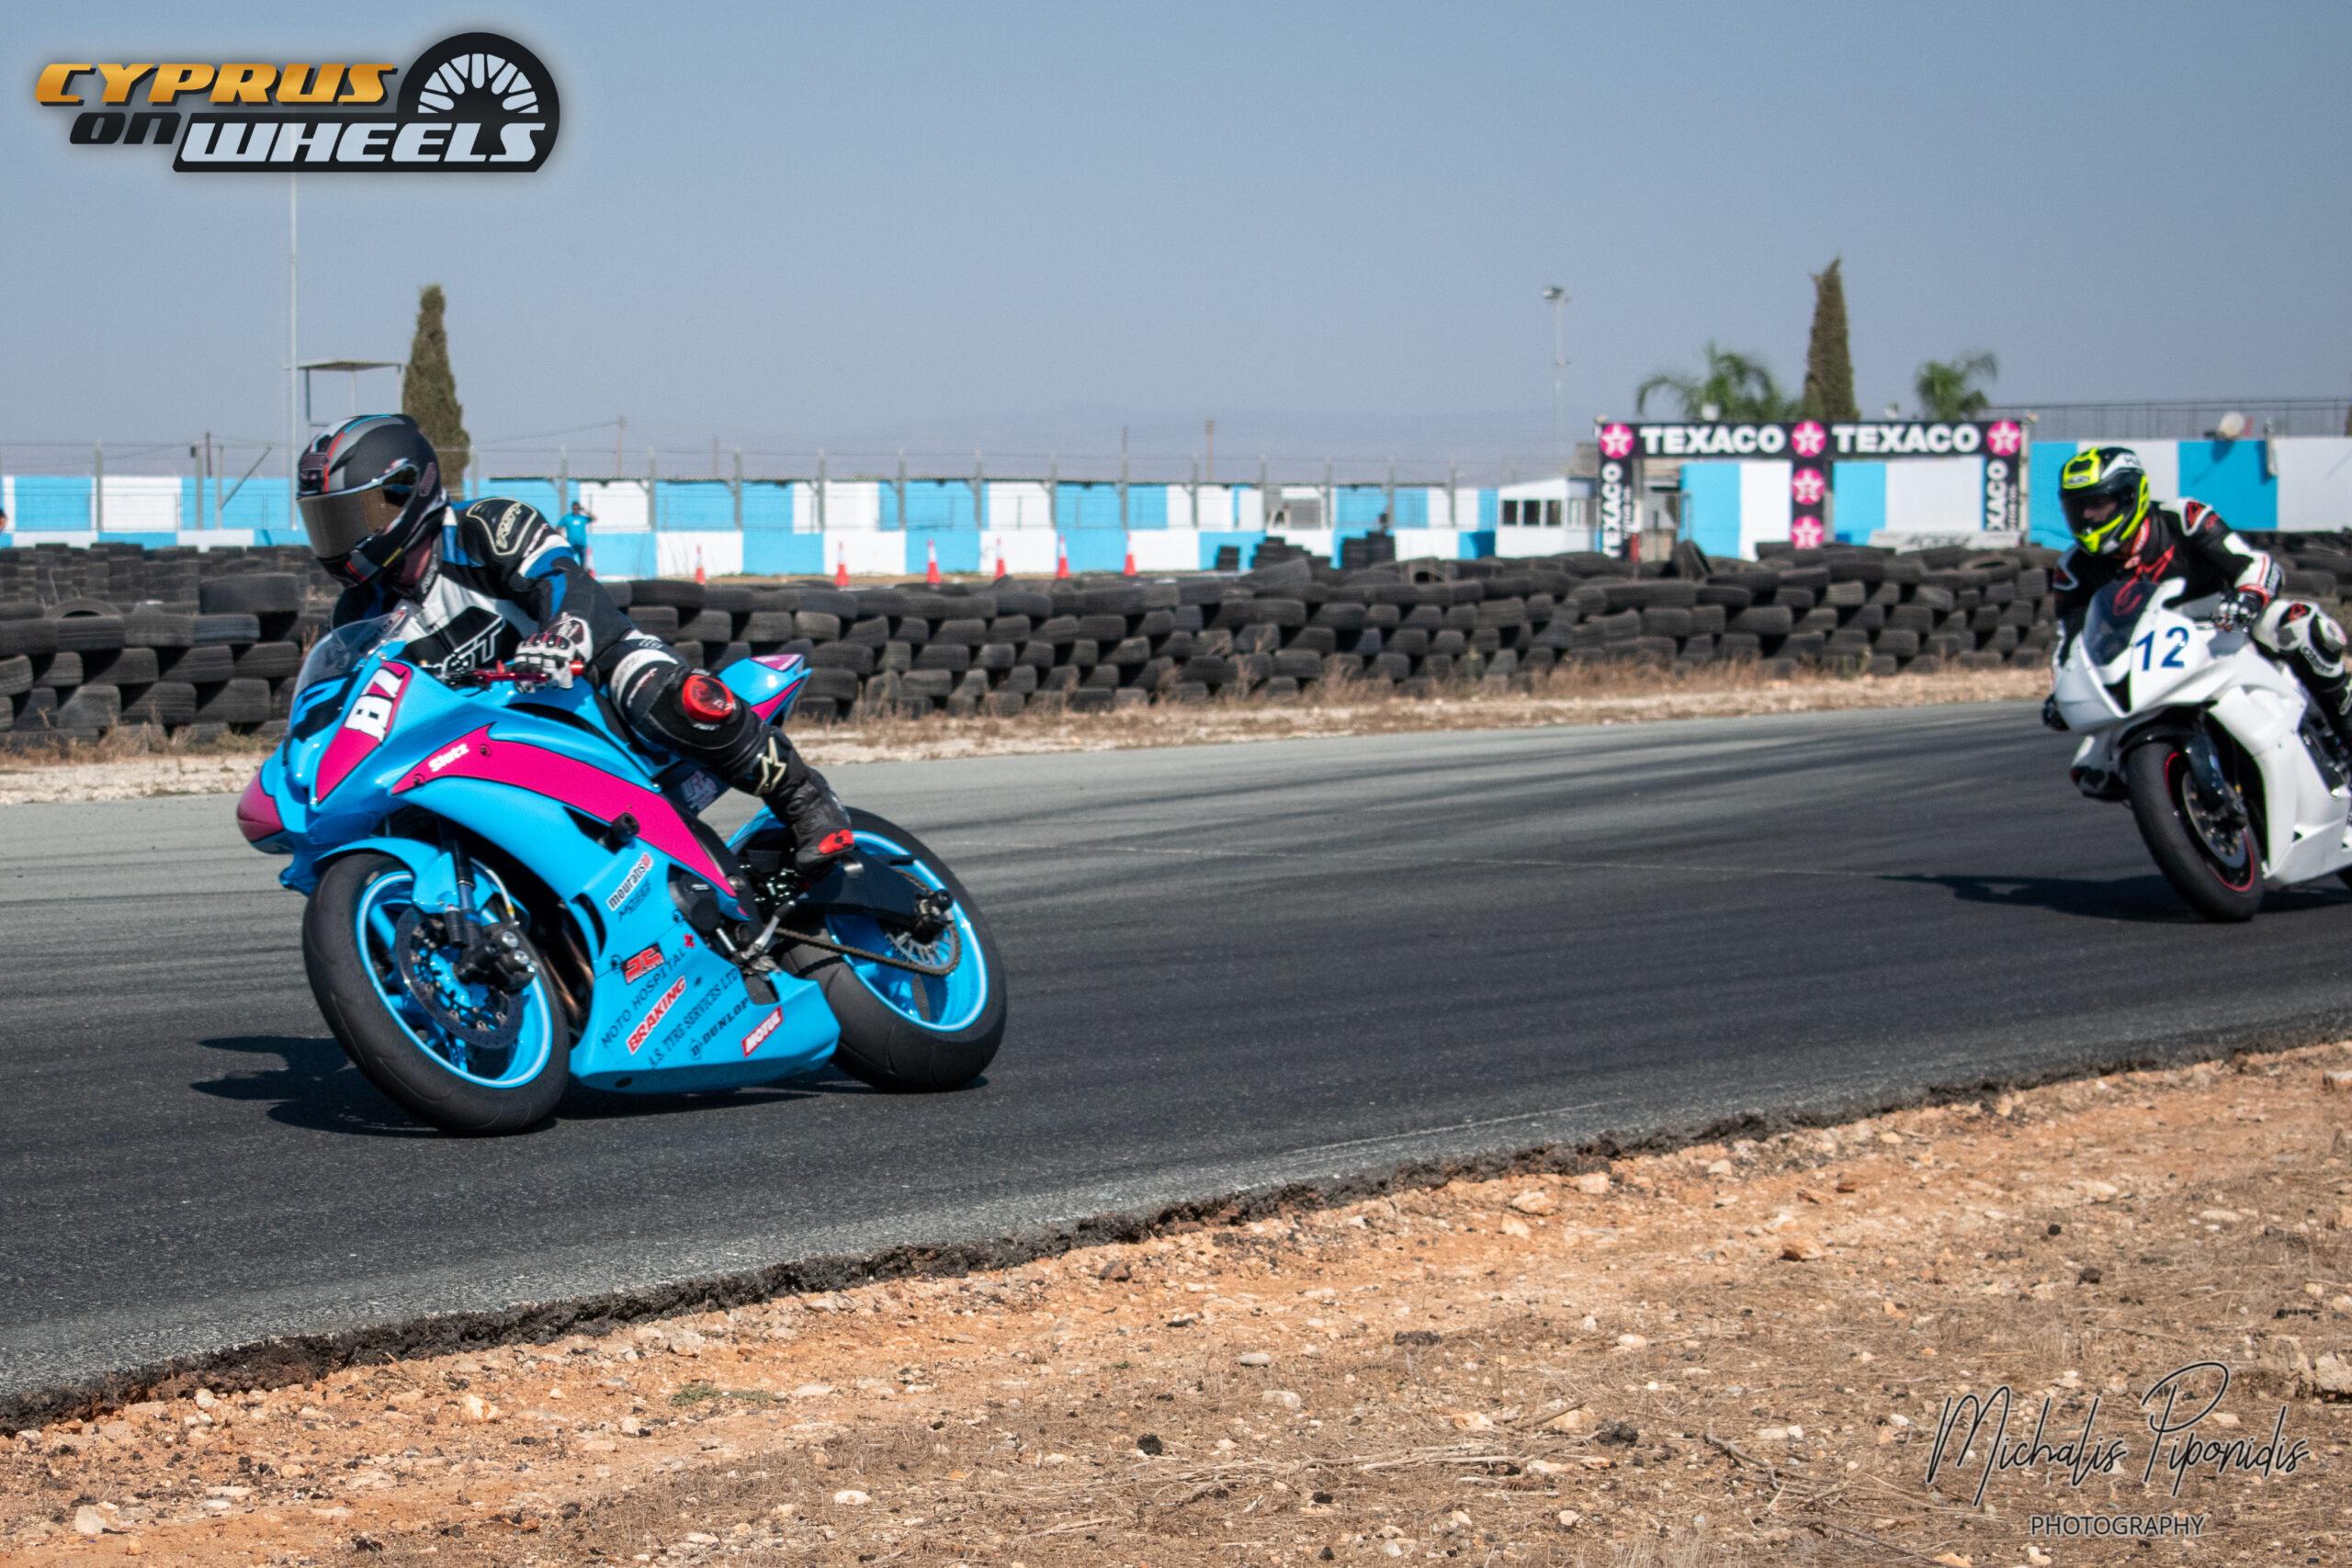 Motorcycles racing